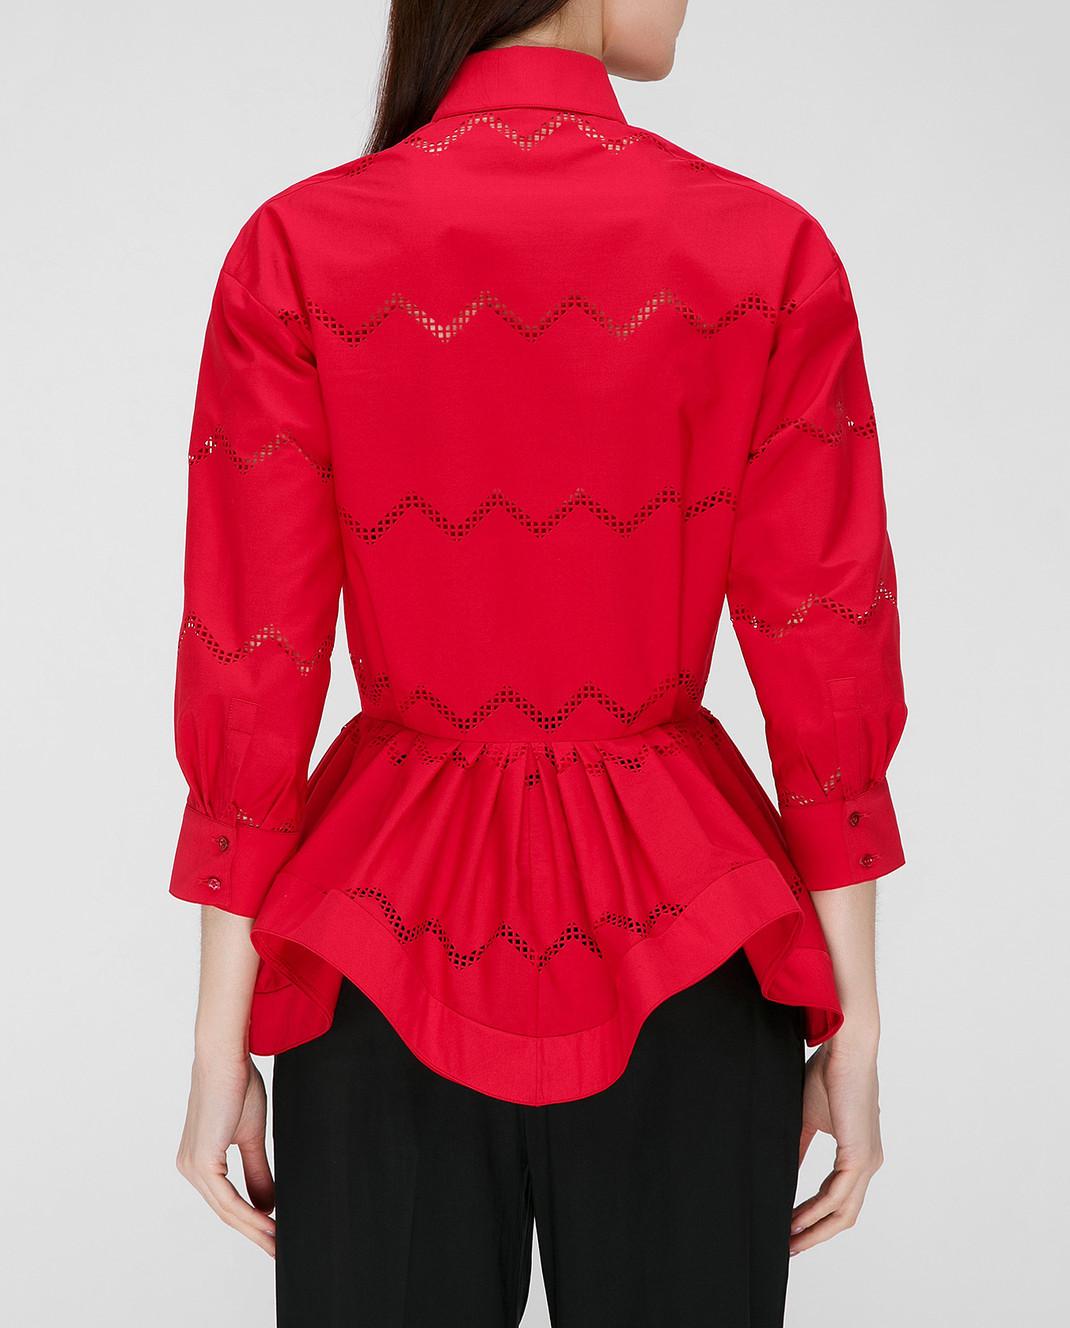 Azzedine Alaia Красная блуза 7S9C081RTL49 изображение 4